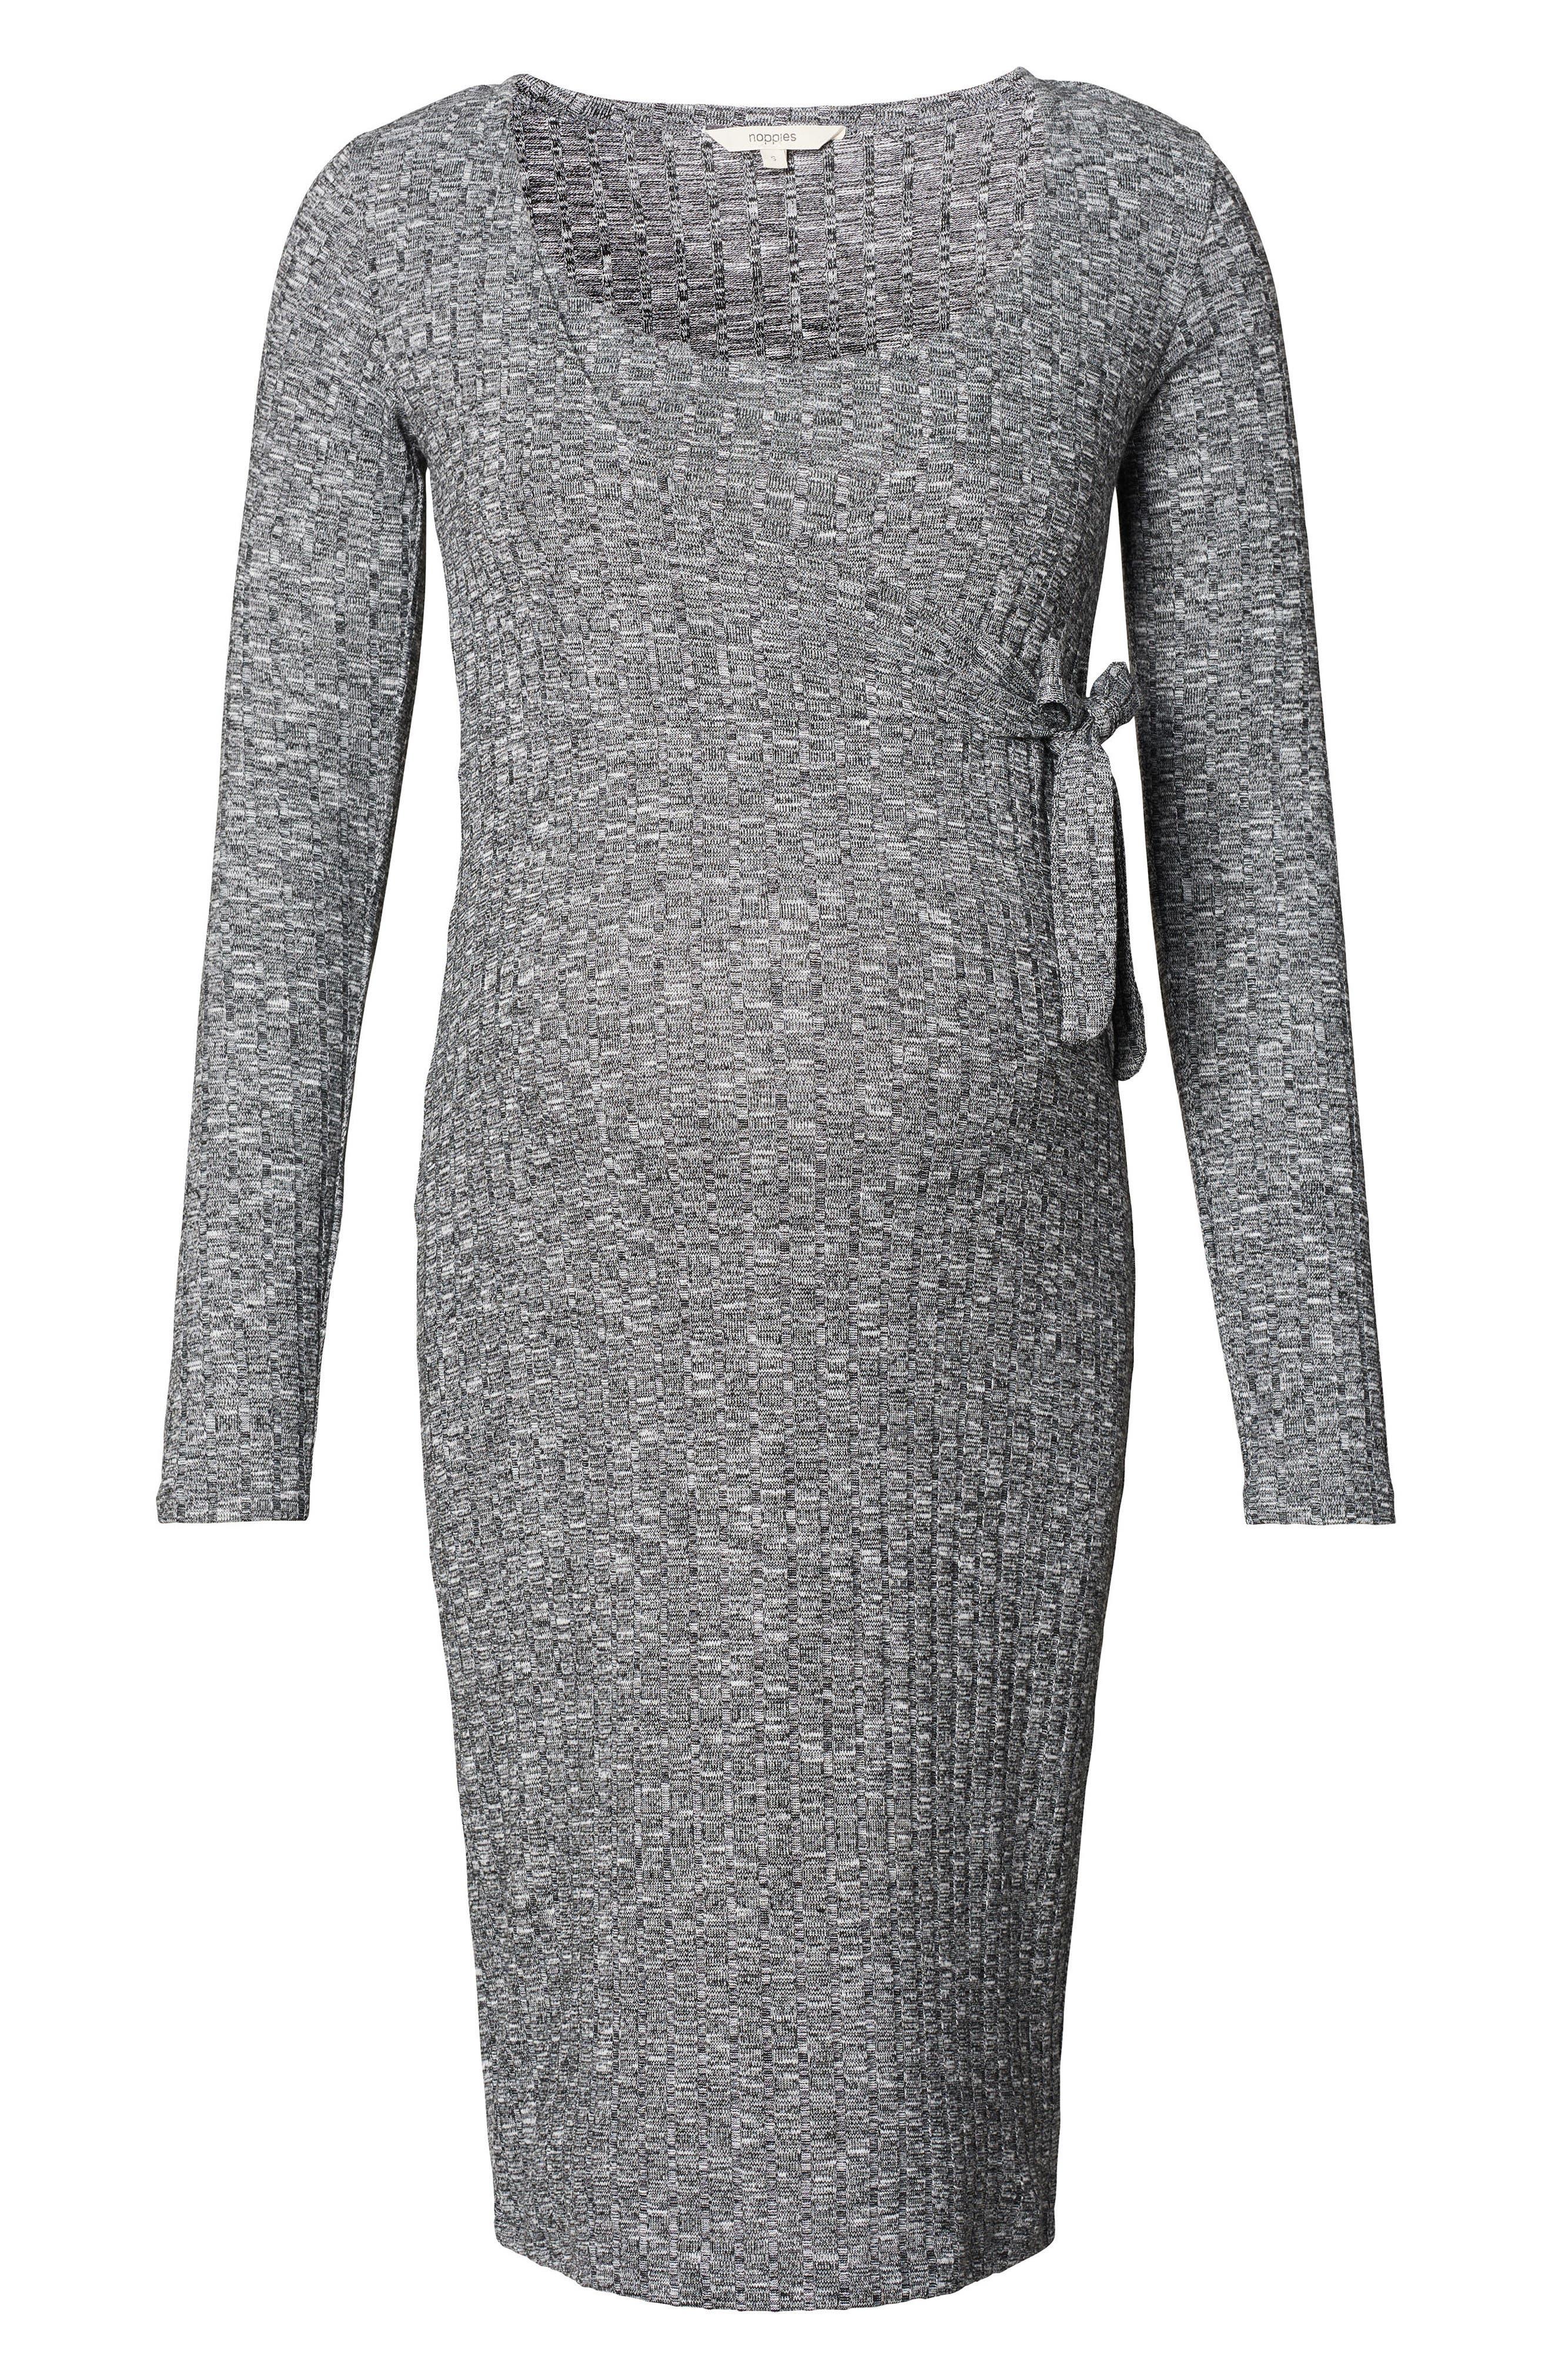 Giulia Maternity Sweater Dress,                         Main,                         color, Anthracite Melange